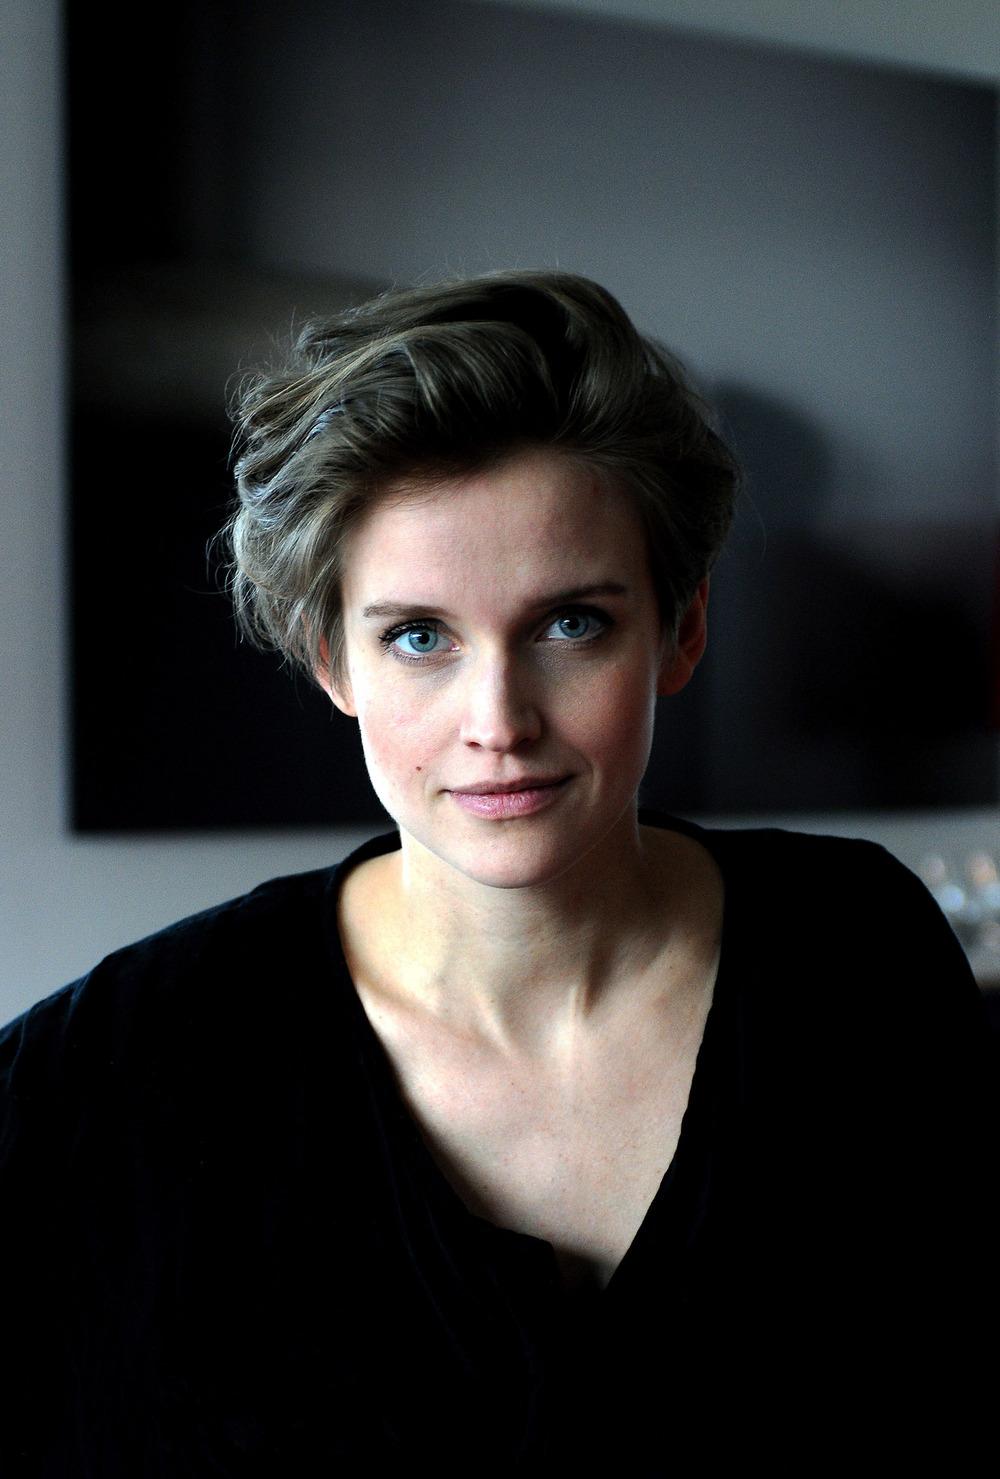 anna_lidström Bengt_Lagerstedt1.jpg